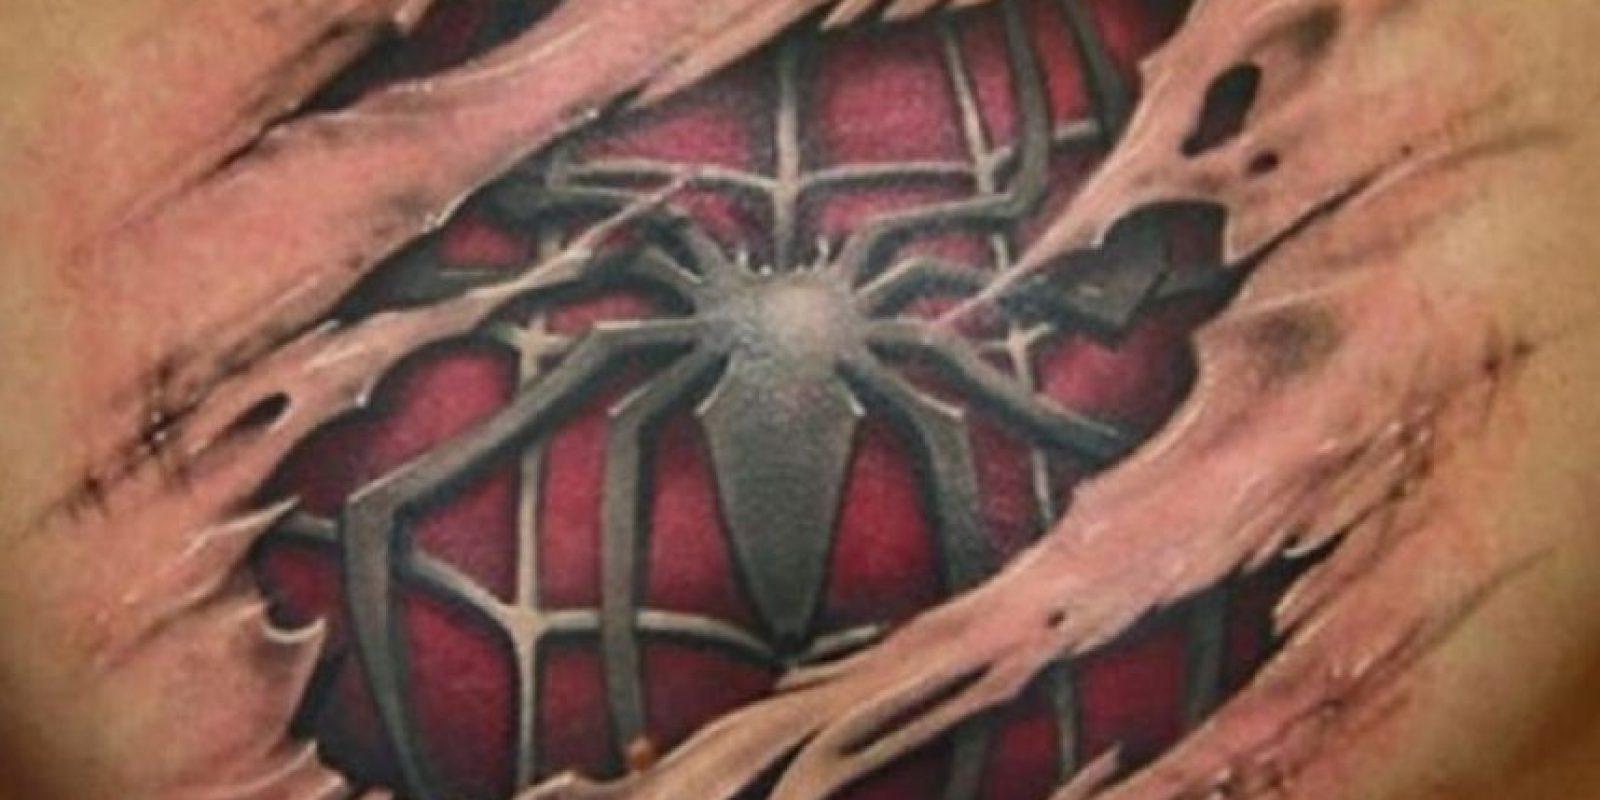 ¿Spiderman? Foto:Reddit